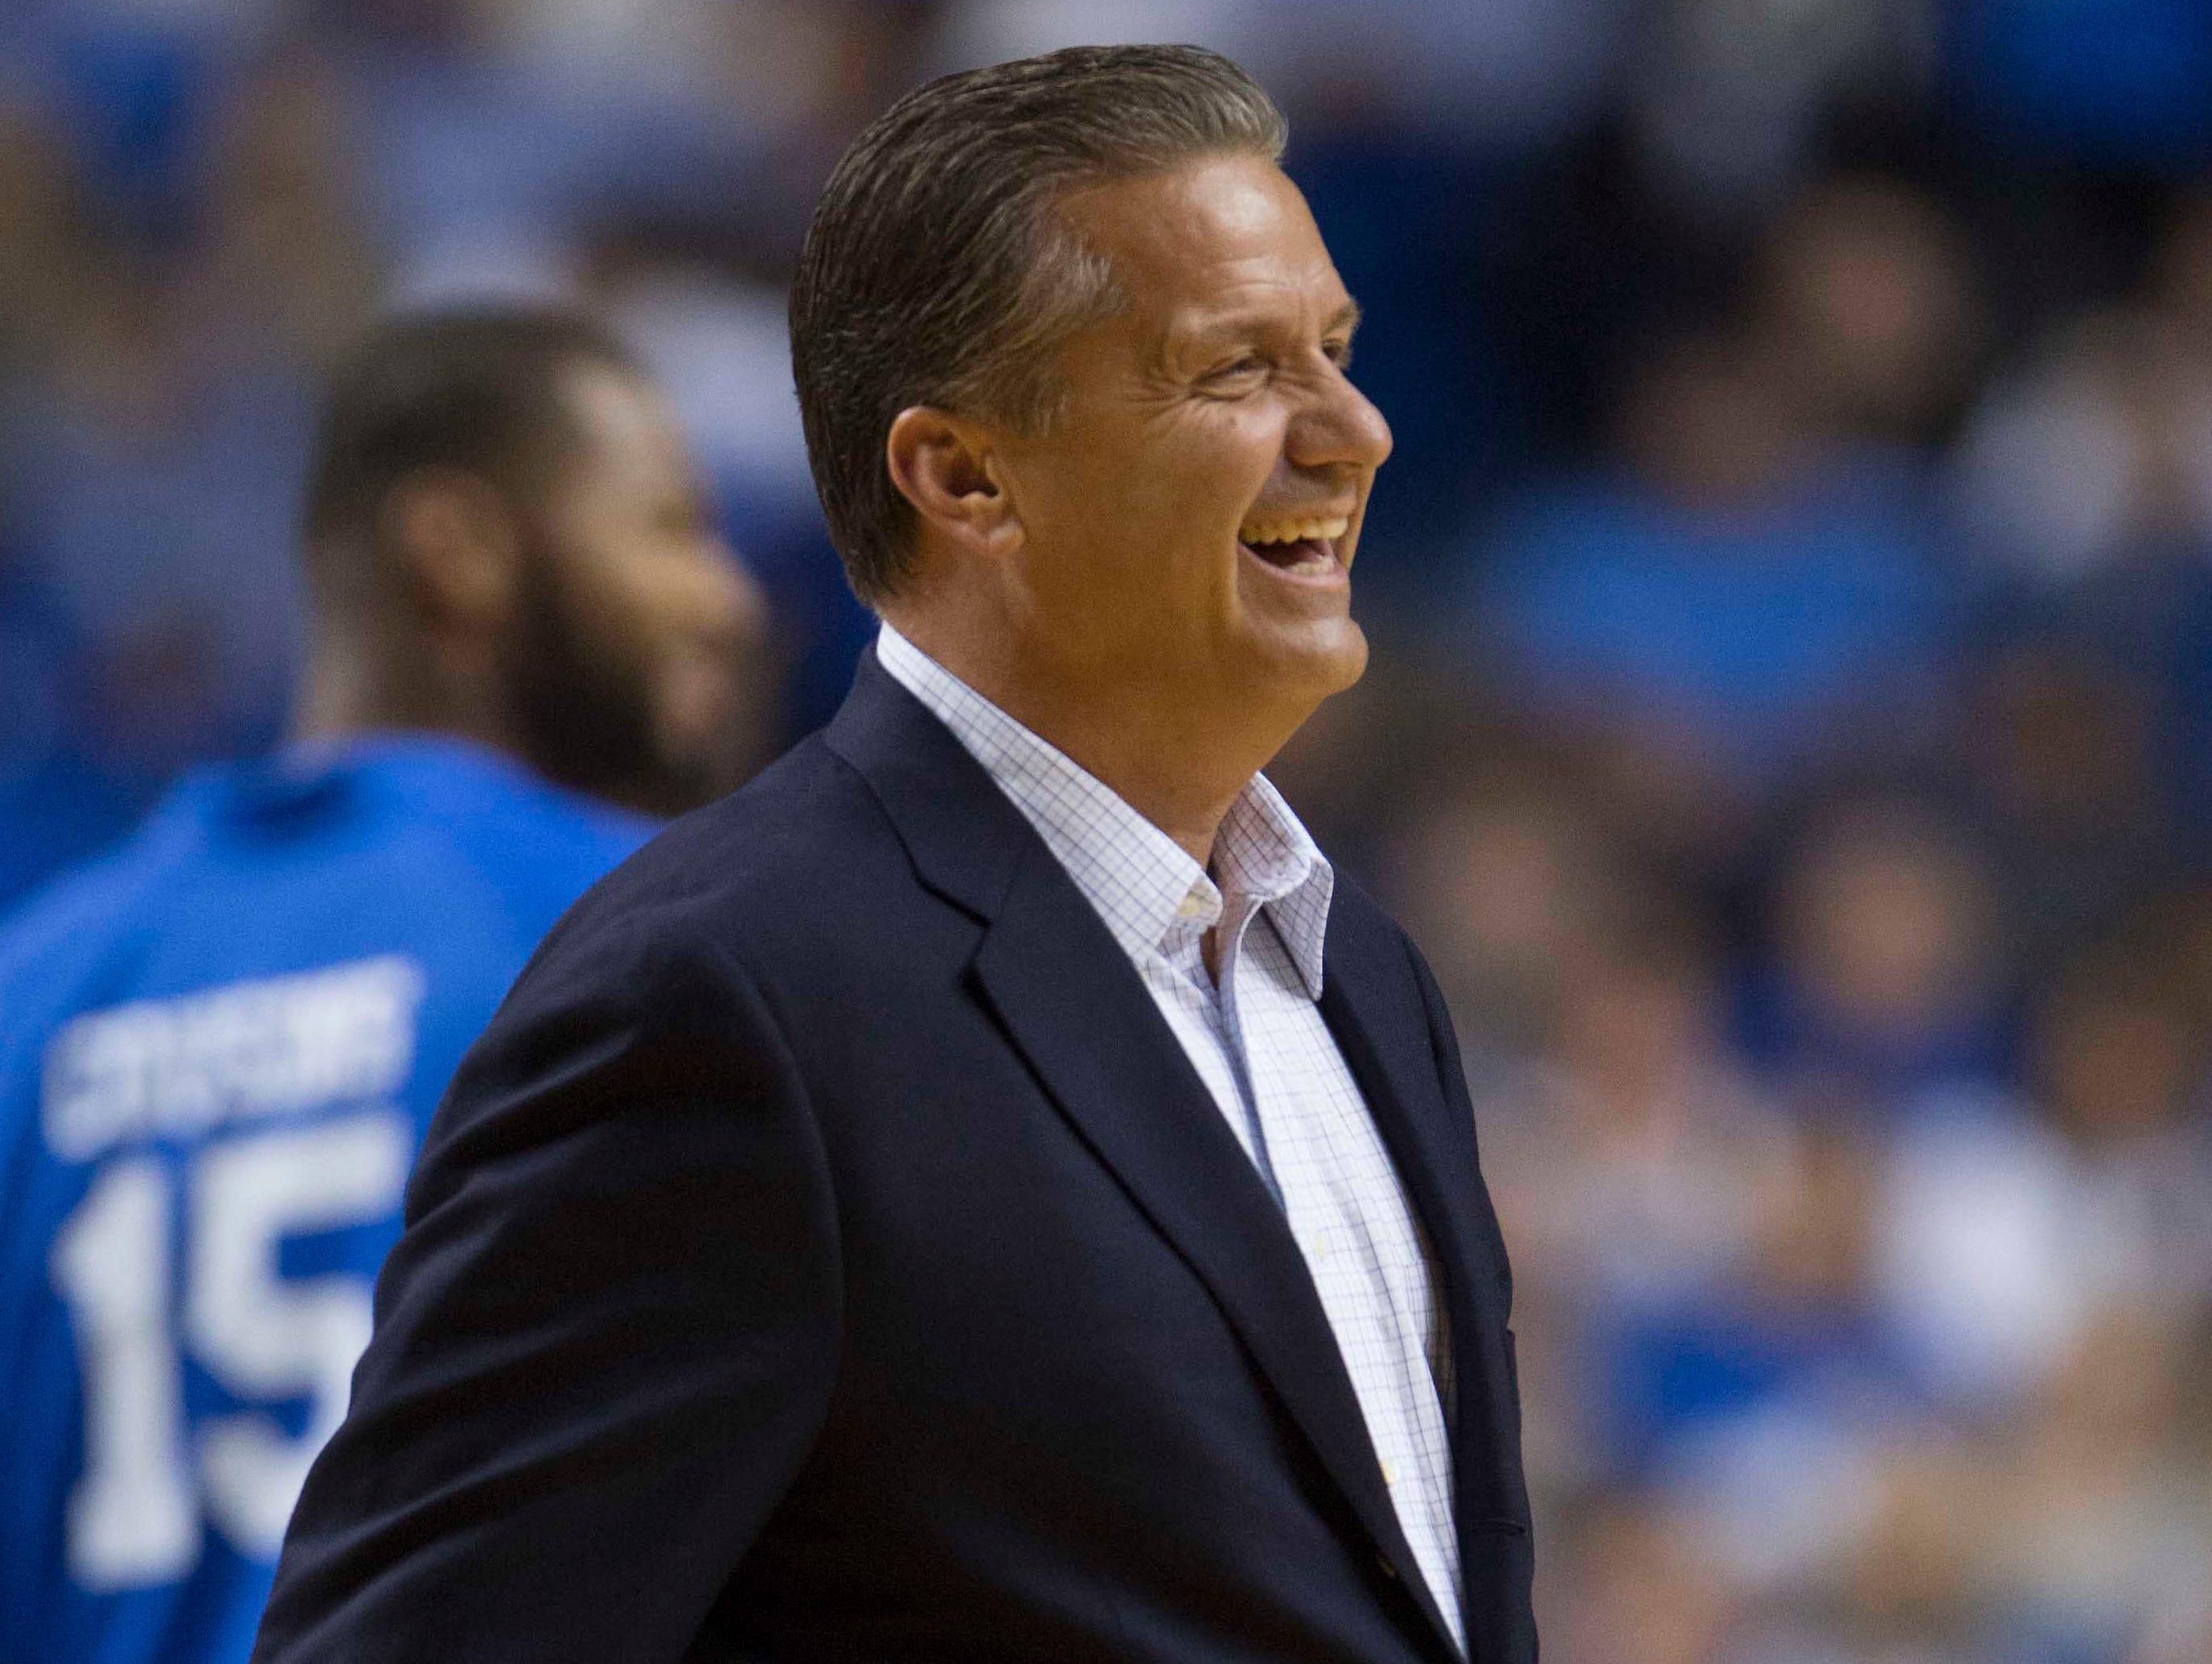 Kentucky Wildcats head coach John Calipari looks on during the Alumni Game against North Carolina at Rupp Arena.